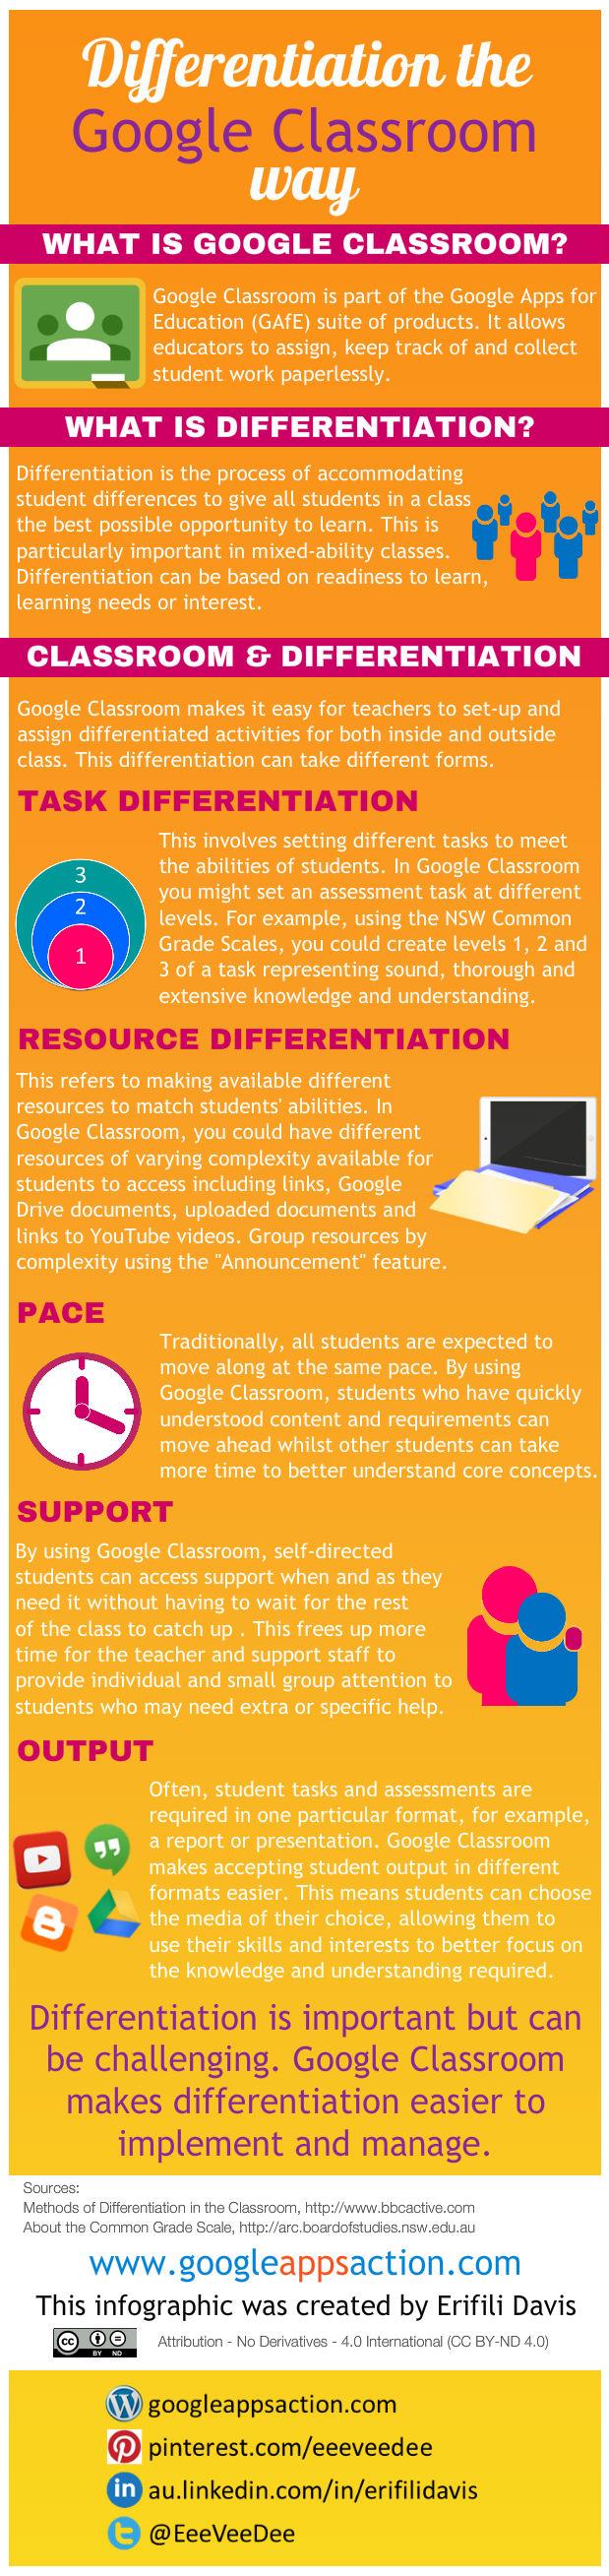 DiffAndGoogleClassroom